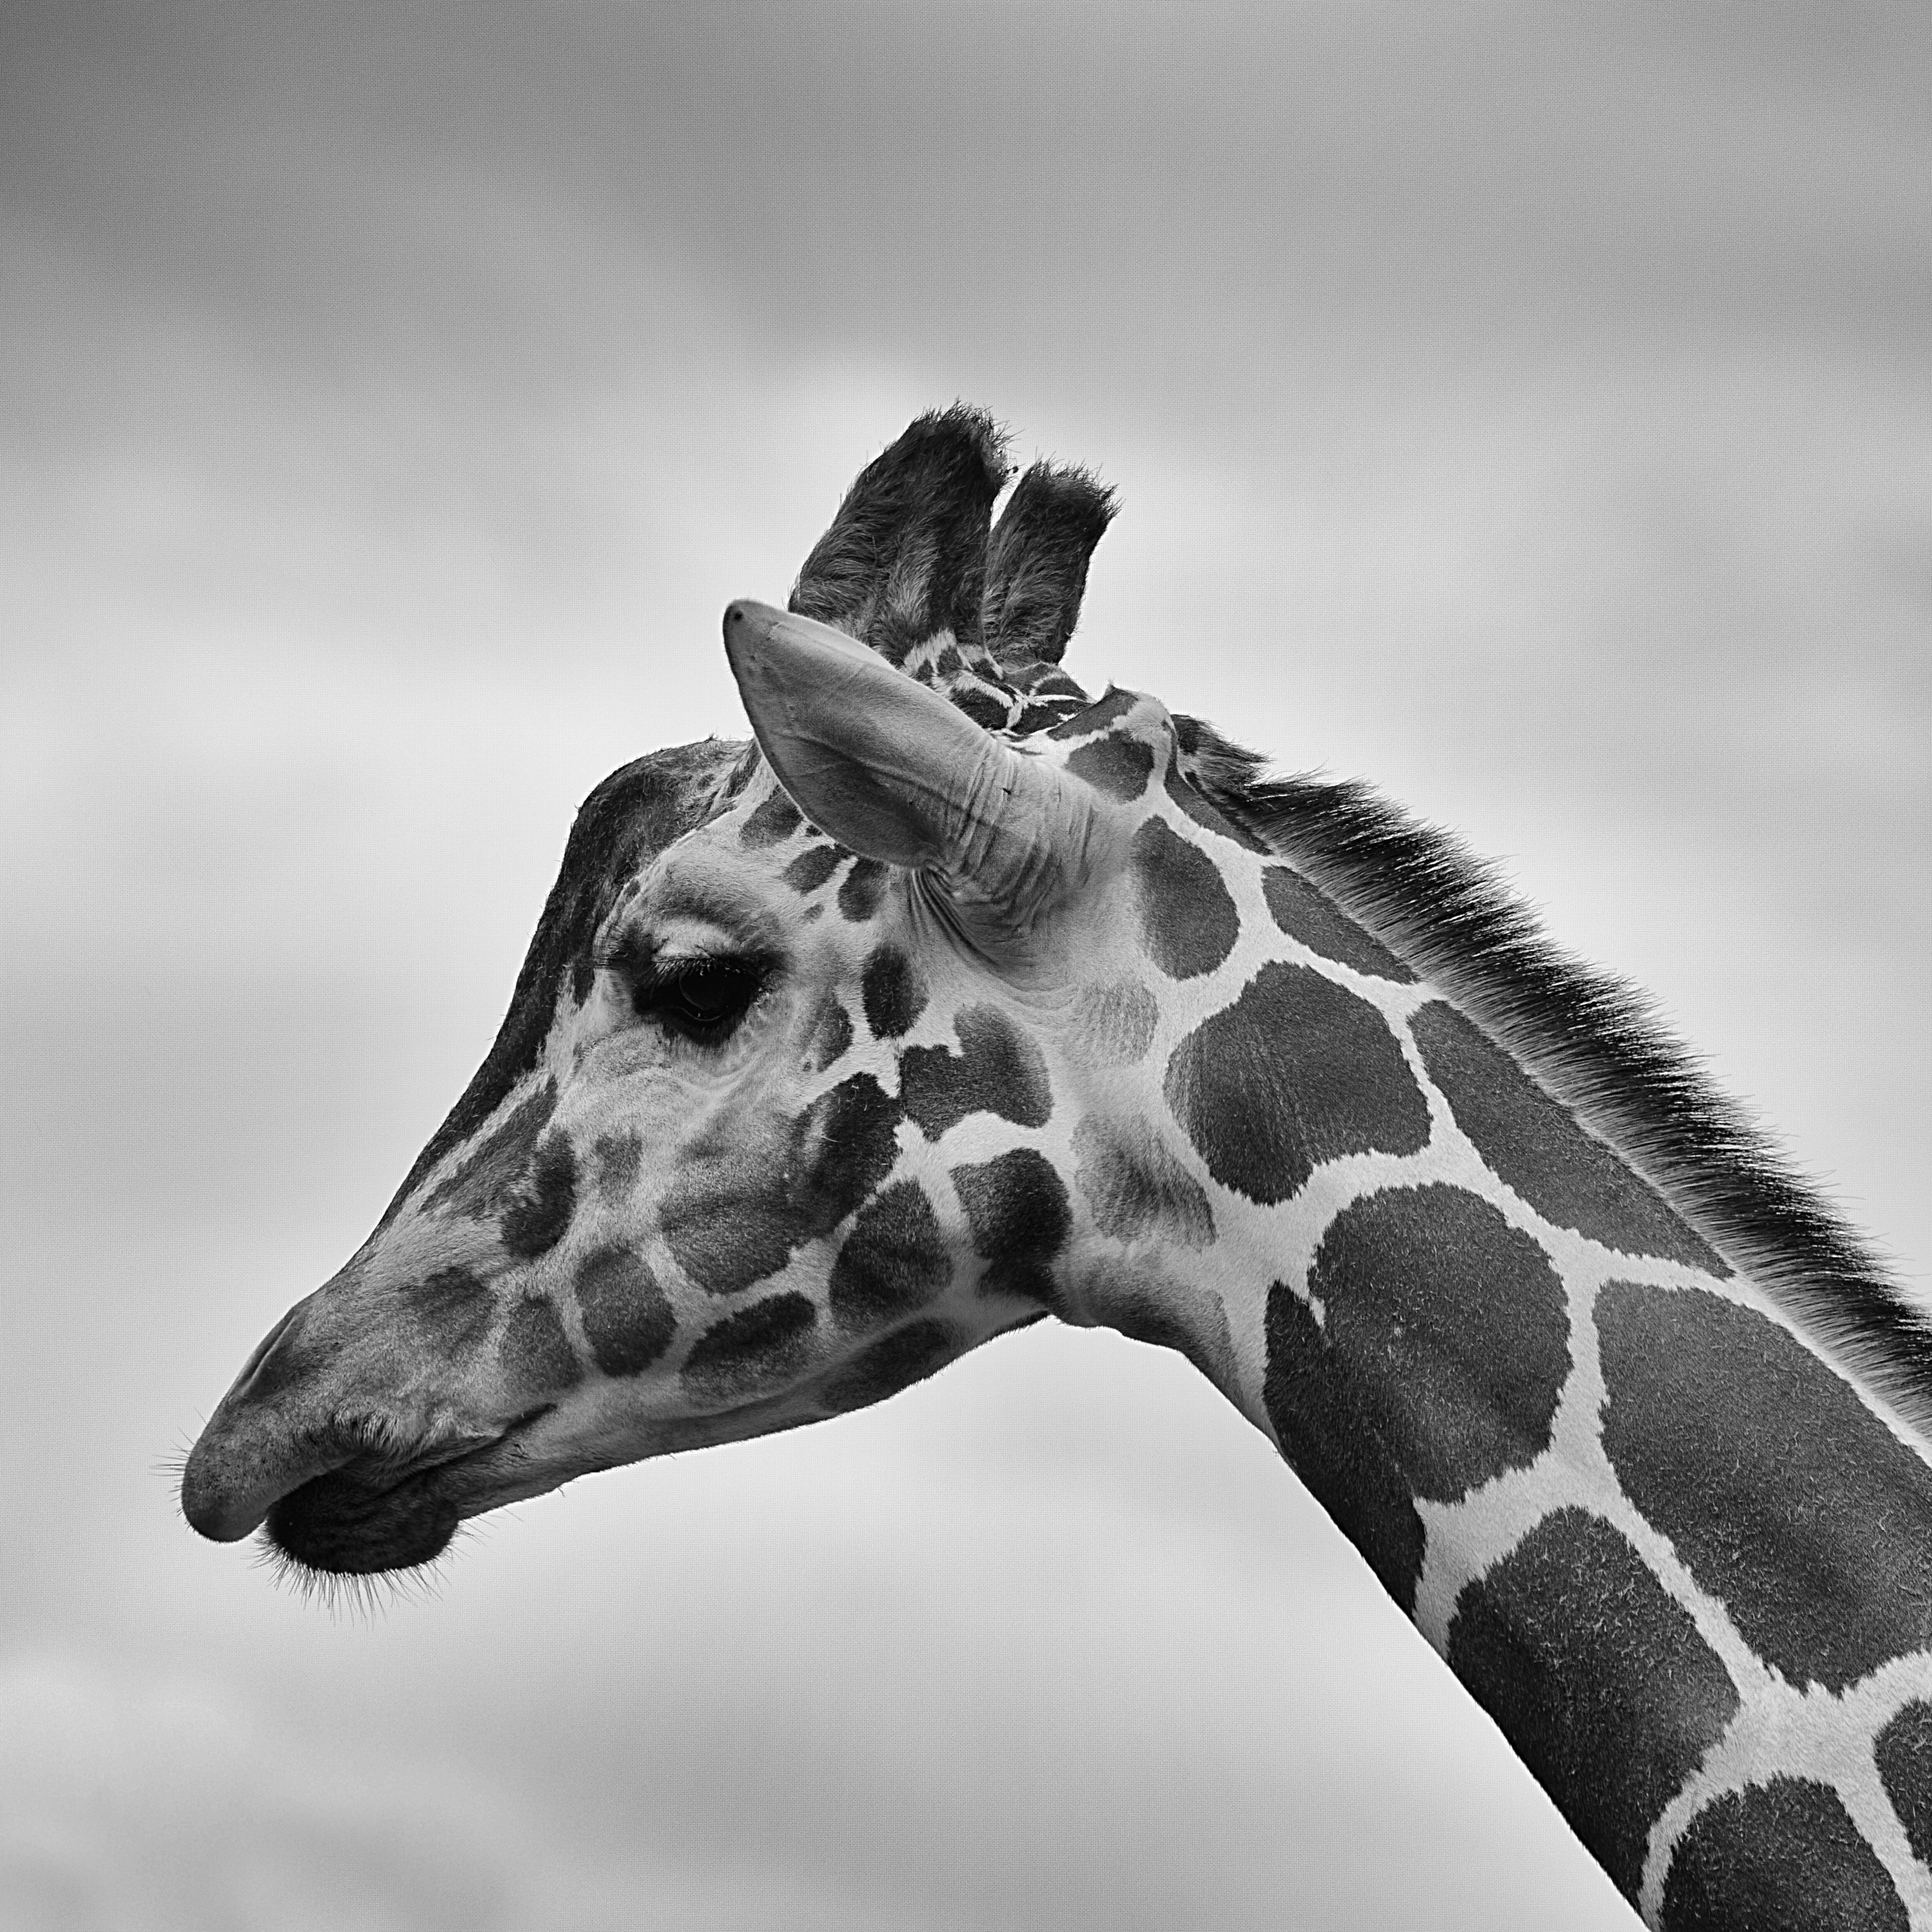 Picallscom  Giraffe in black and white by Dawn Armfield